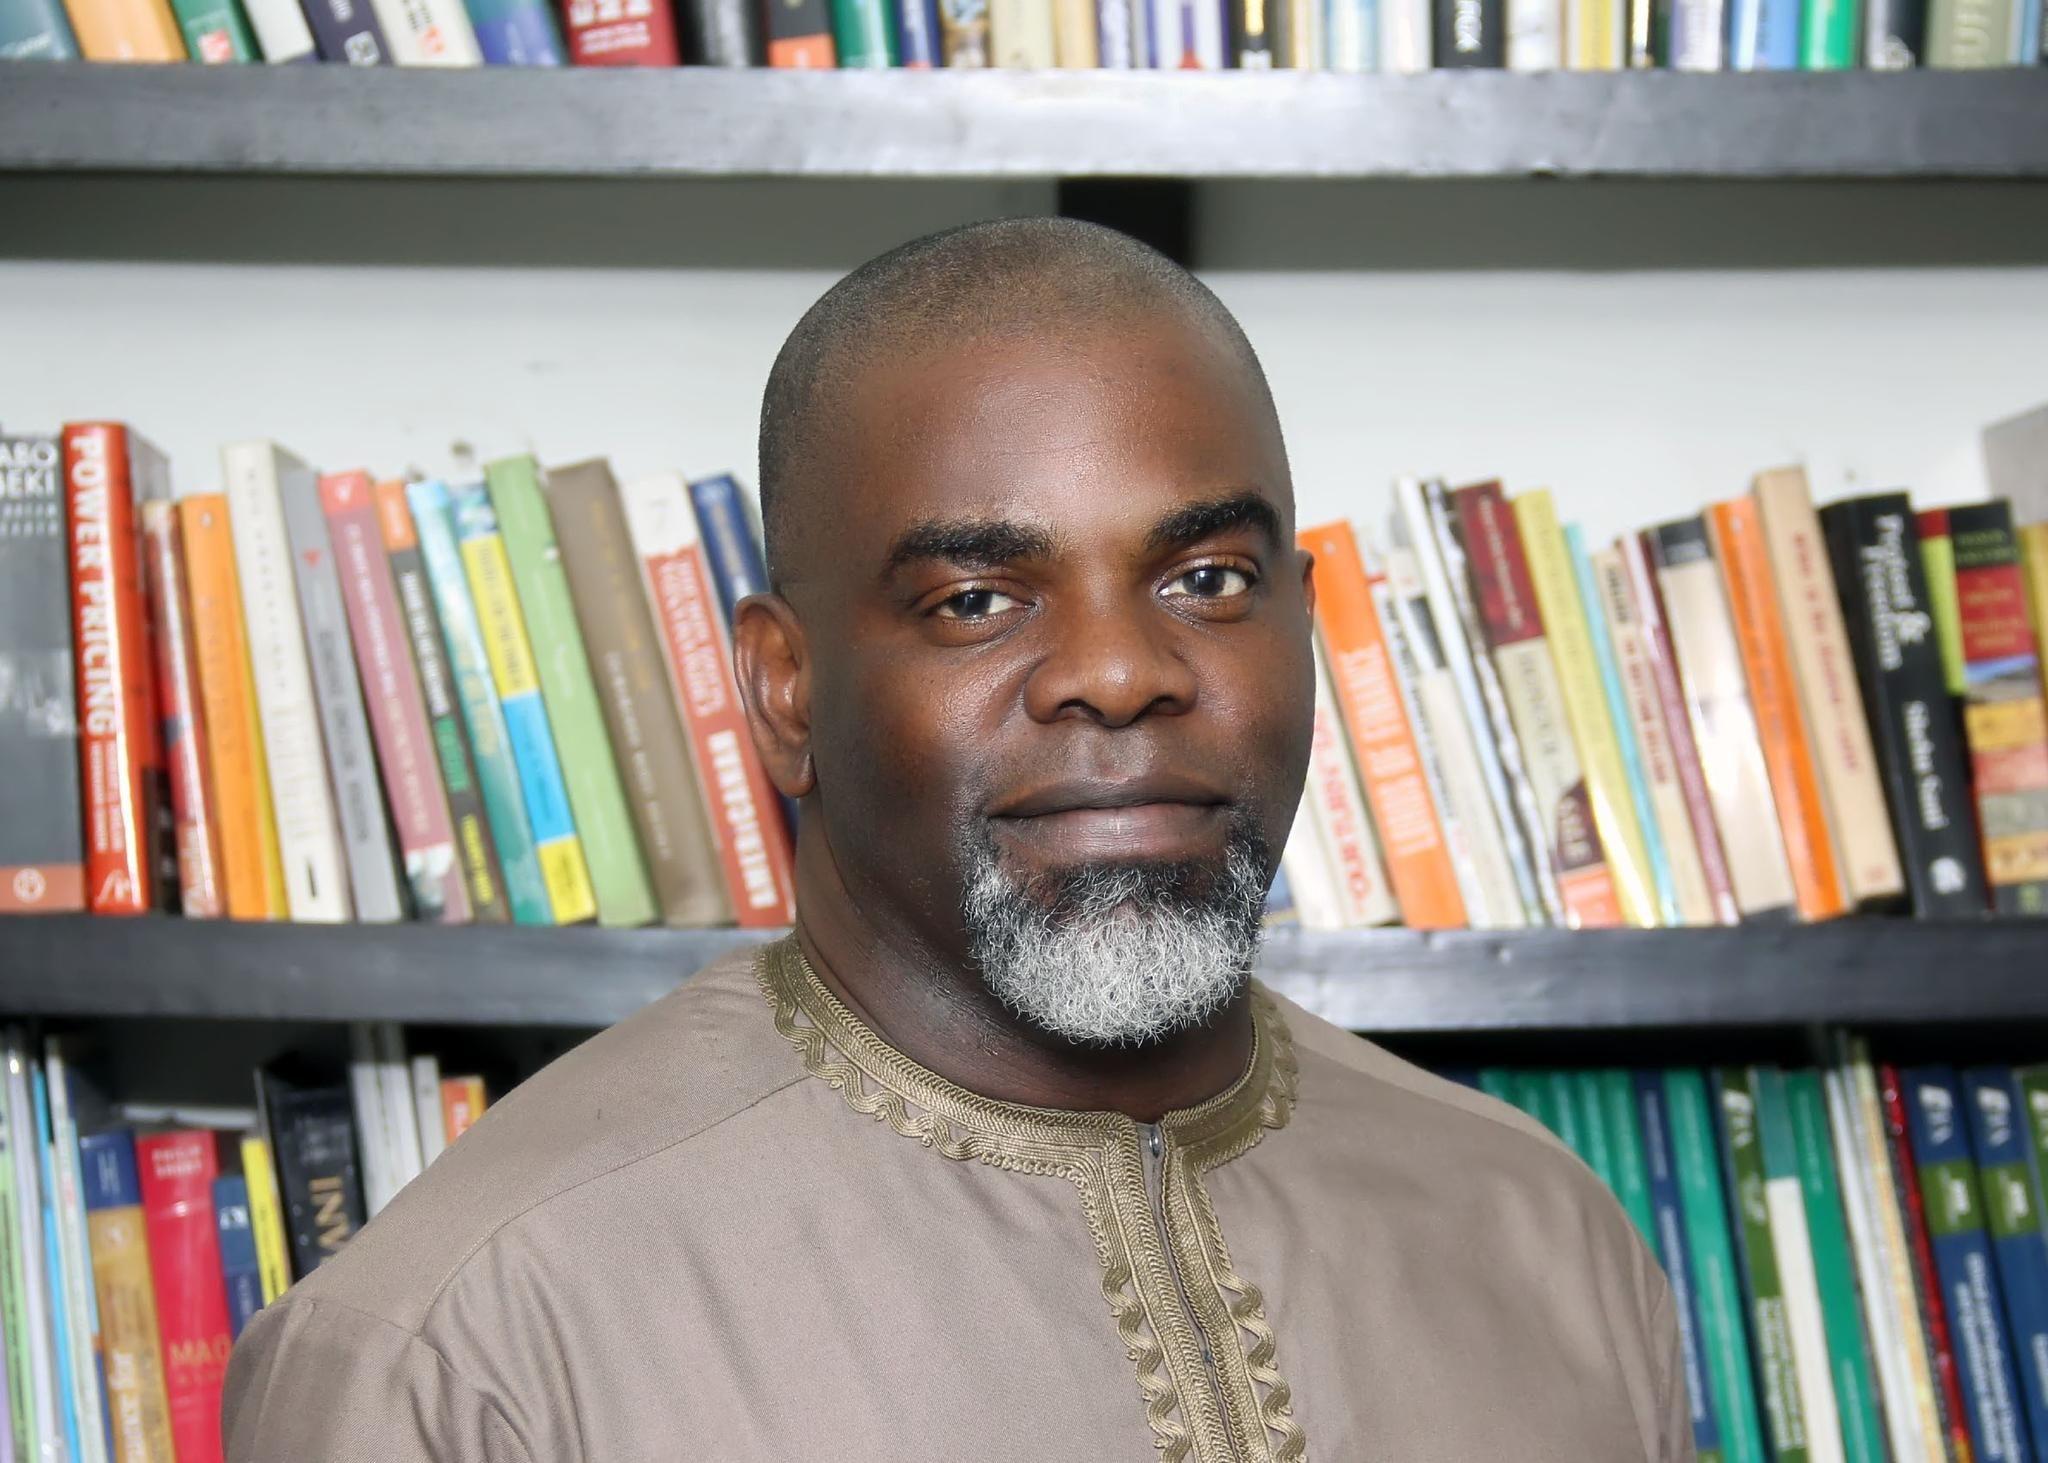 Patrick Okigbo III